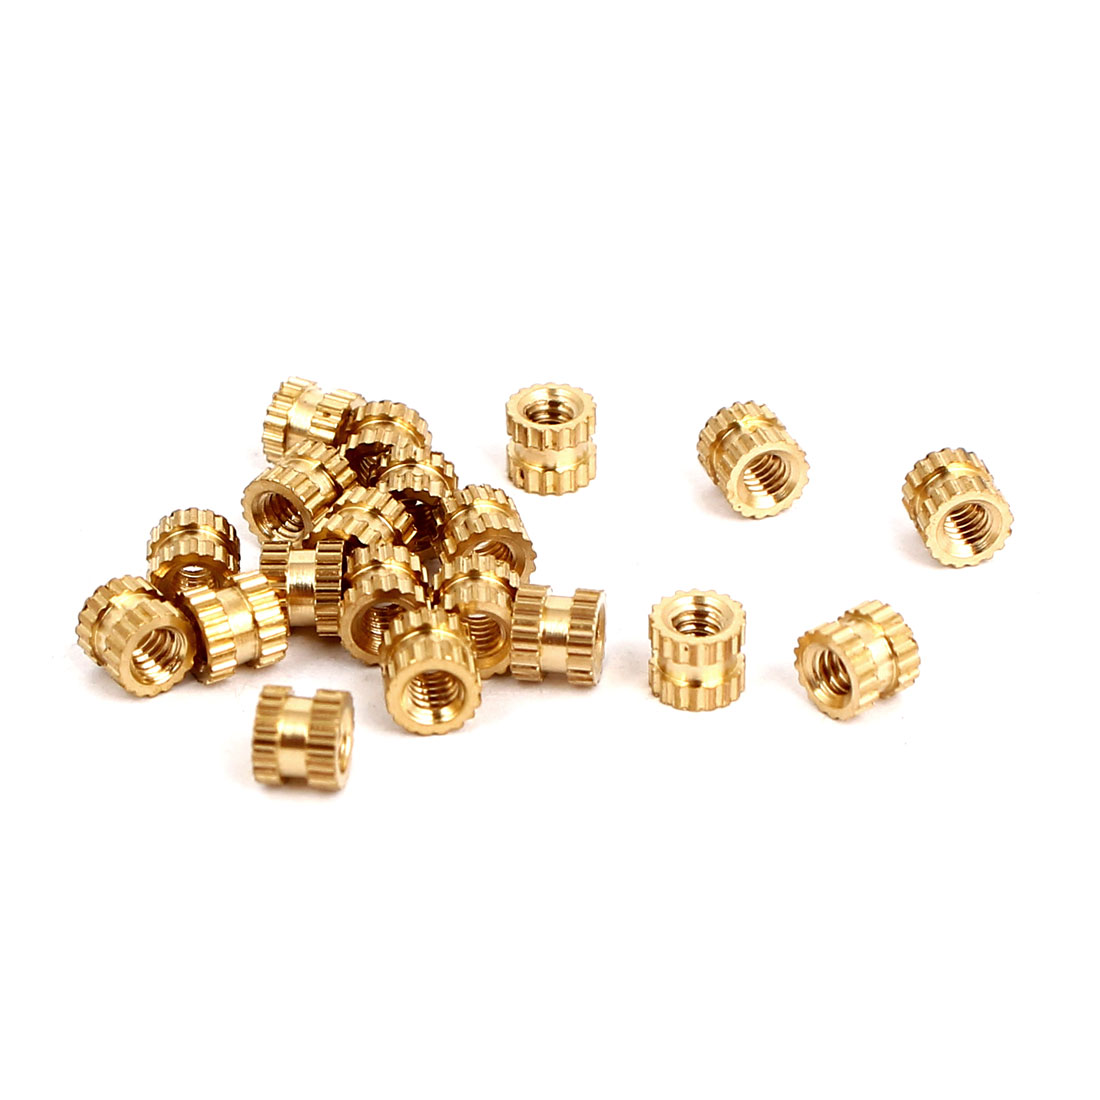 M2x3mmx3.5mm Female Threaded Brass Knurled Insert Embedded Nuts Gold Tone 20pcs